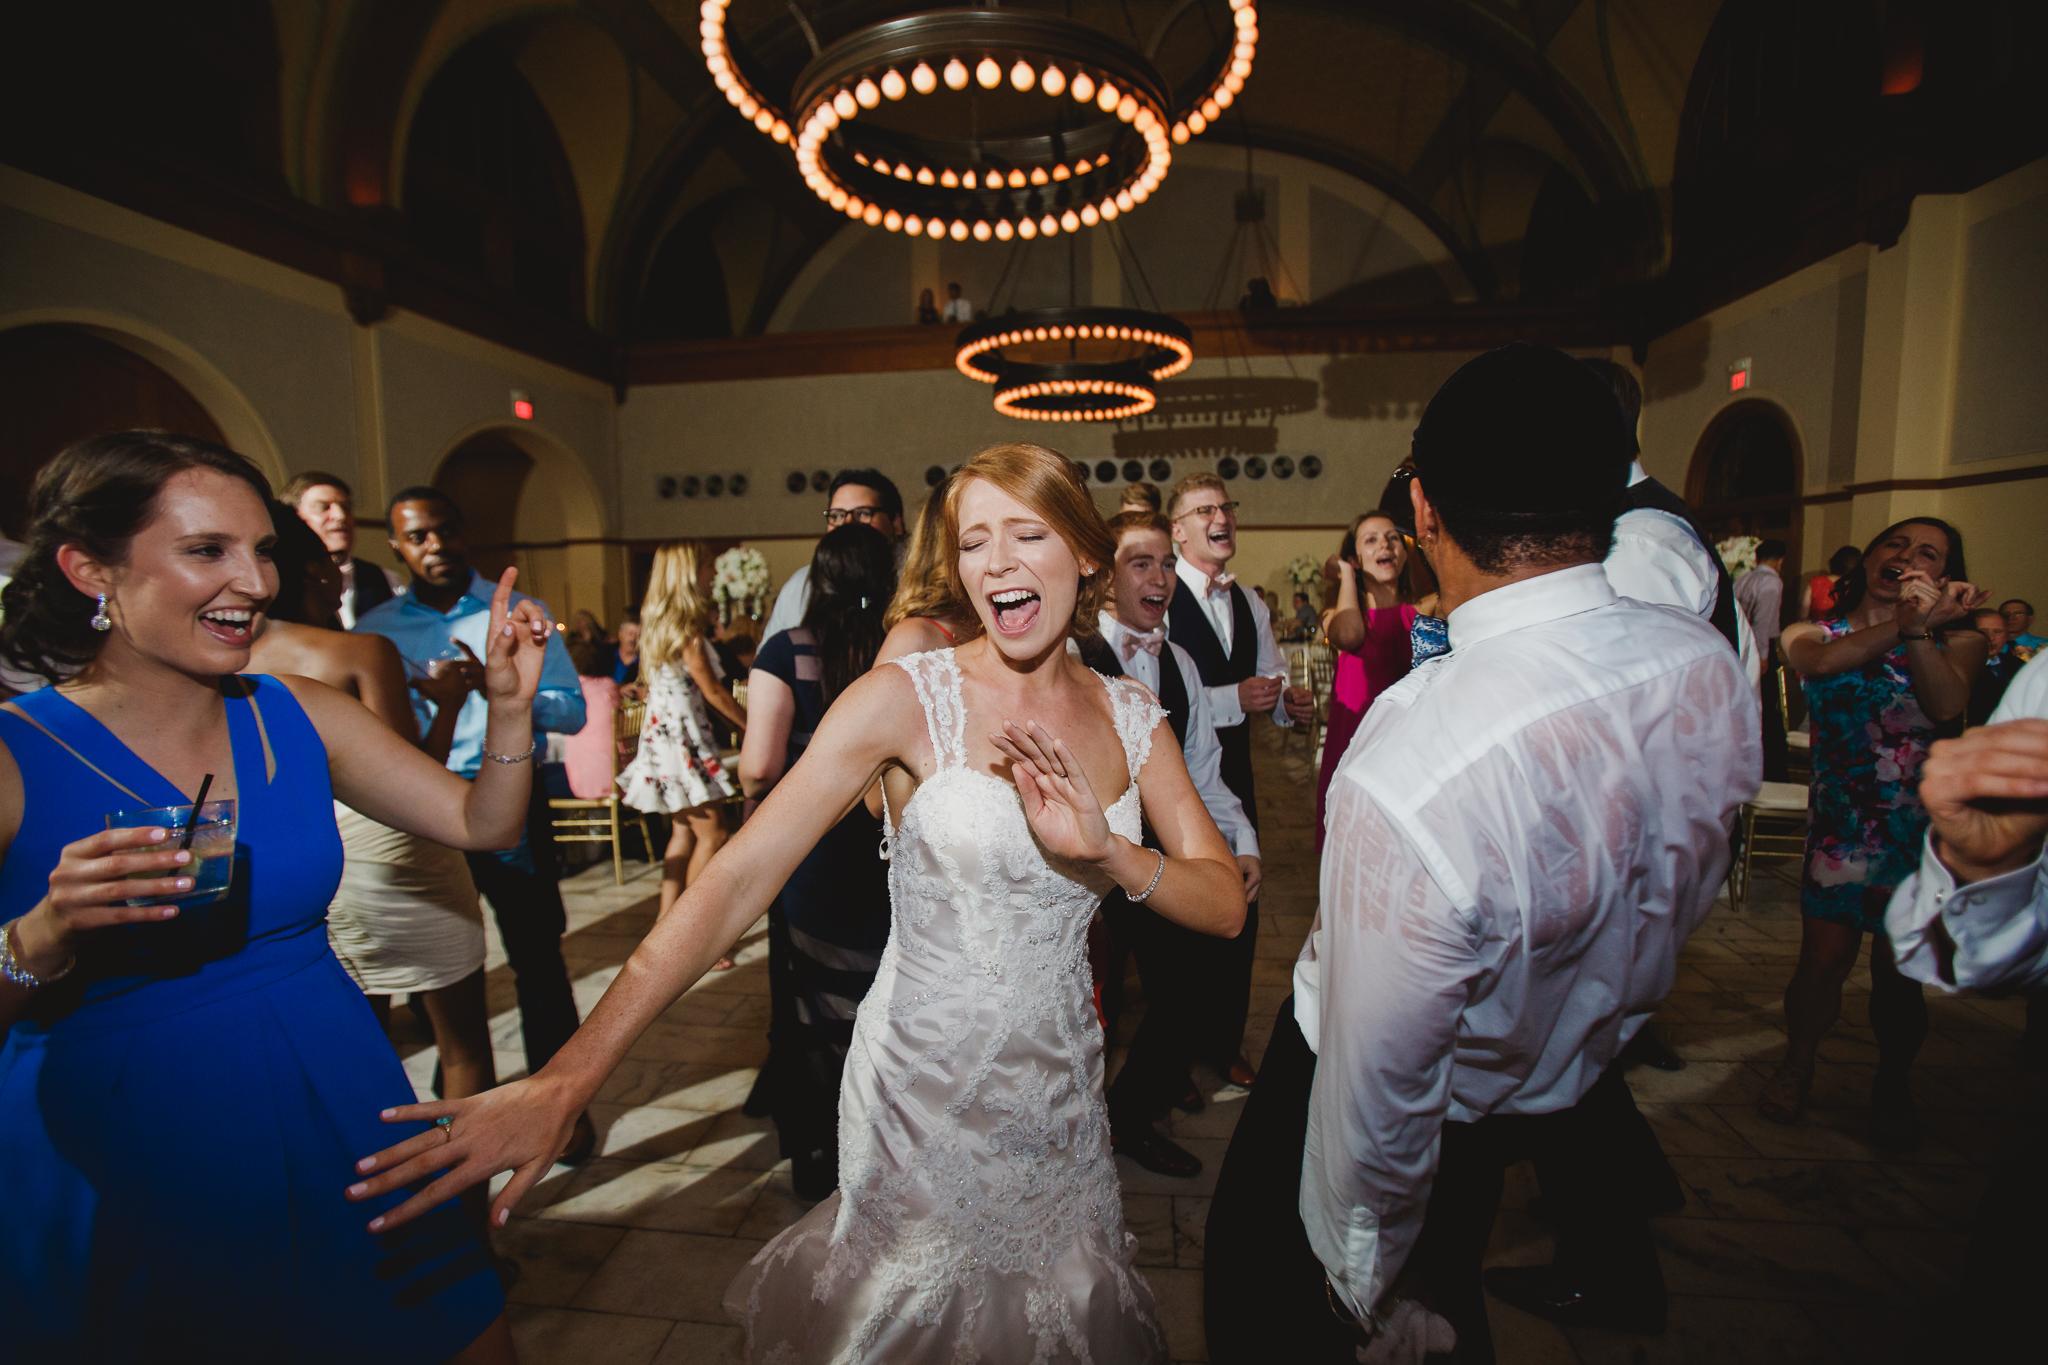 Michael and Kelly - the ashton depot - wedding DFW - wedding photographer- elizalde photography (137 of 150).jpg